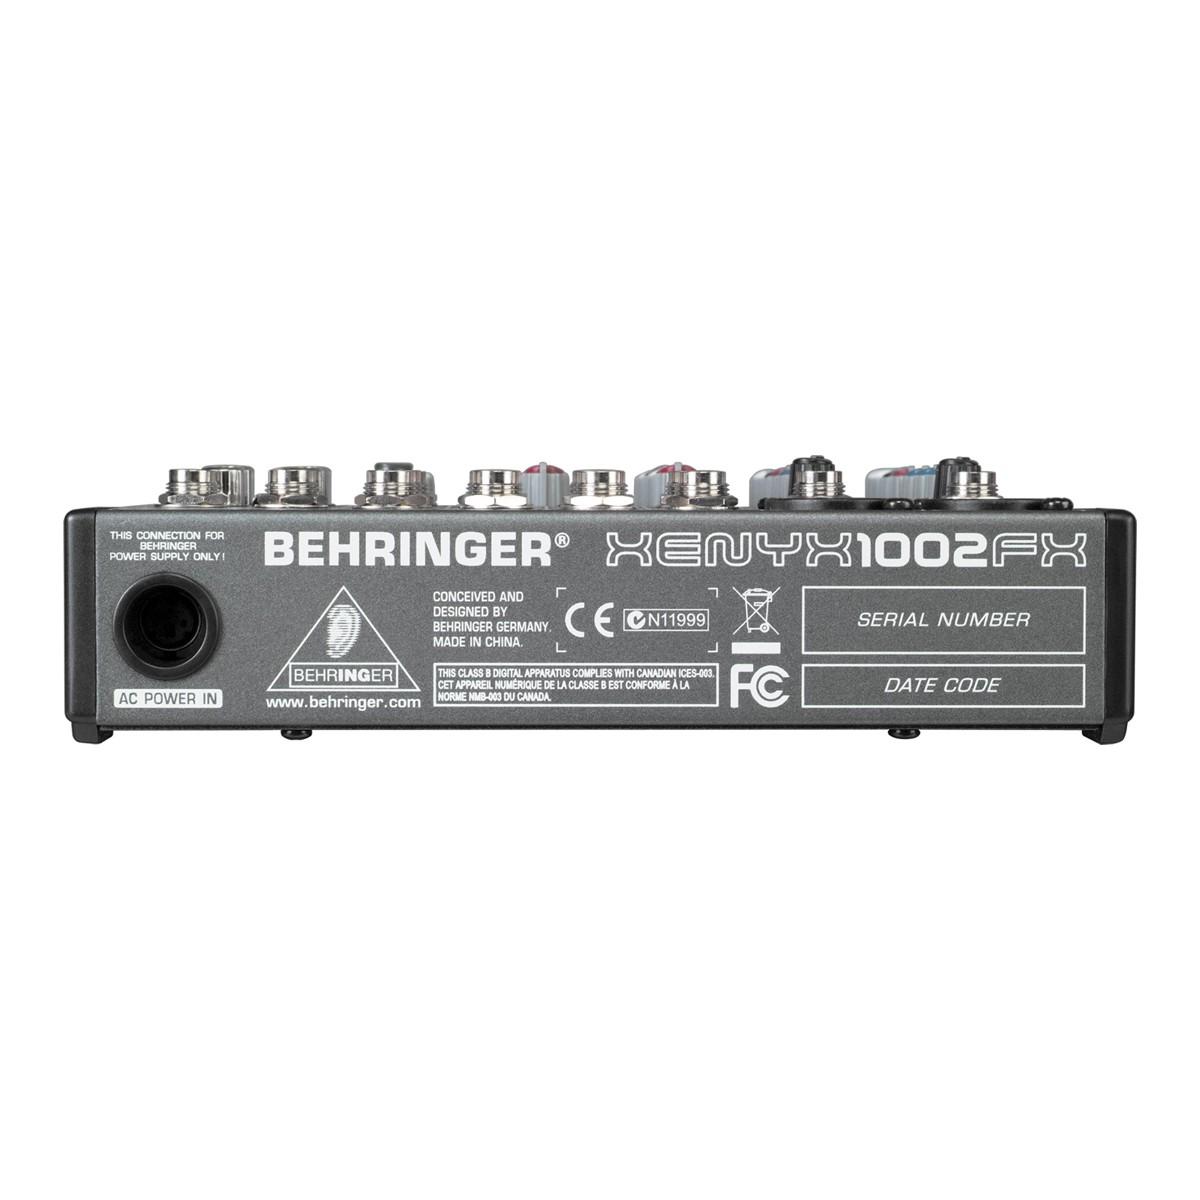 Mesa 10 entradas, AUX, FX e 48v Behringer Xenix 1002FX